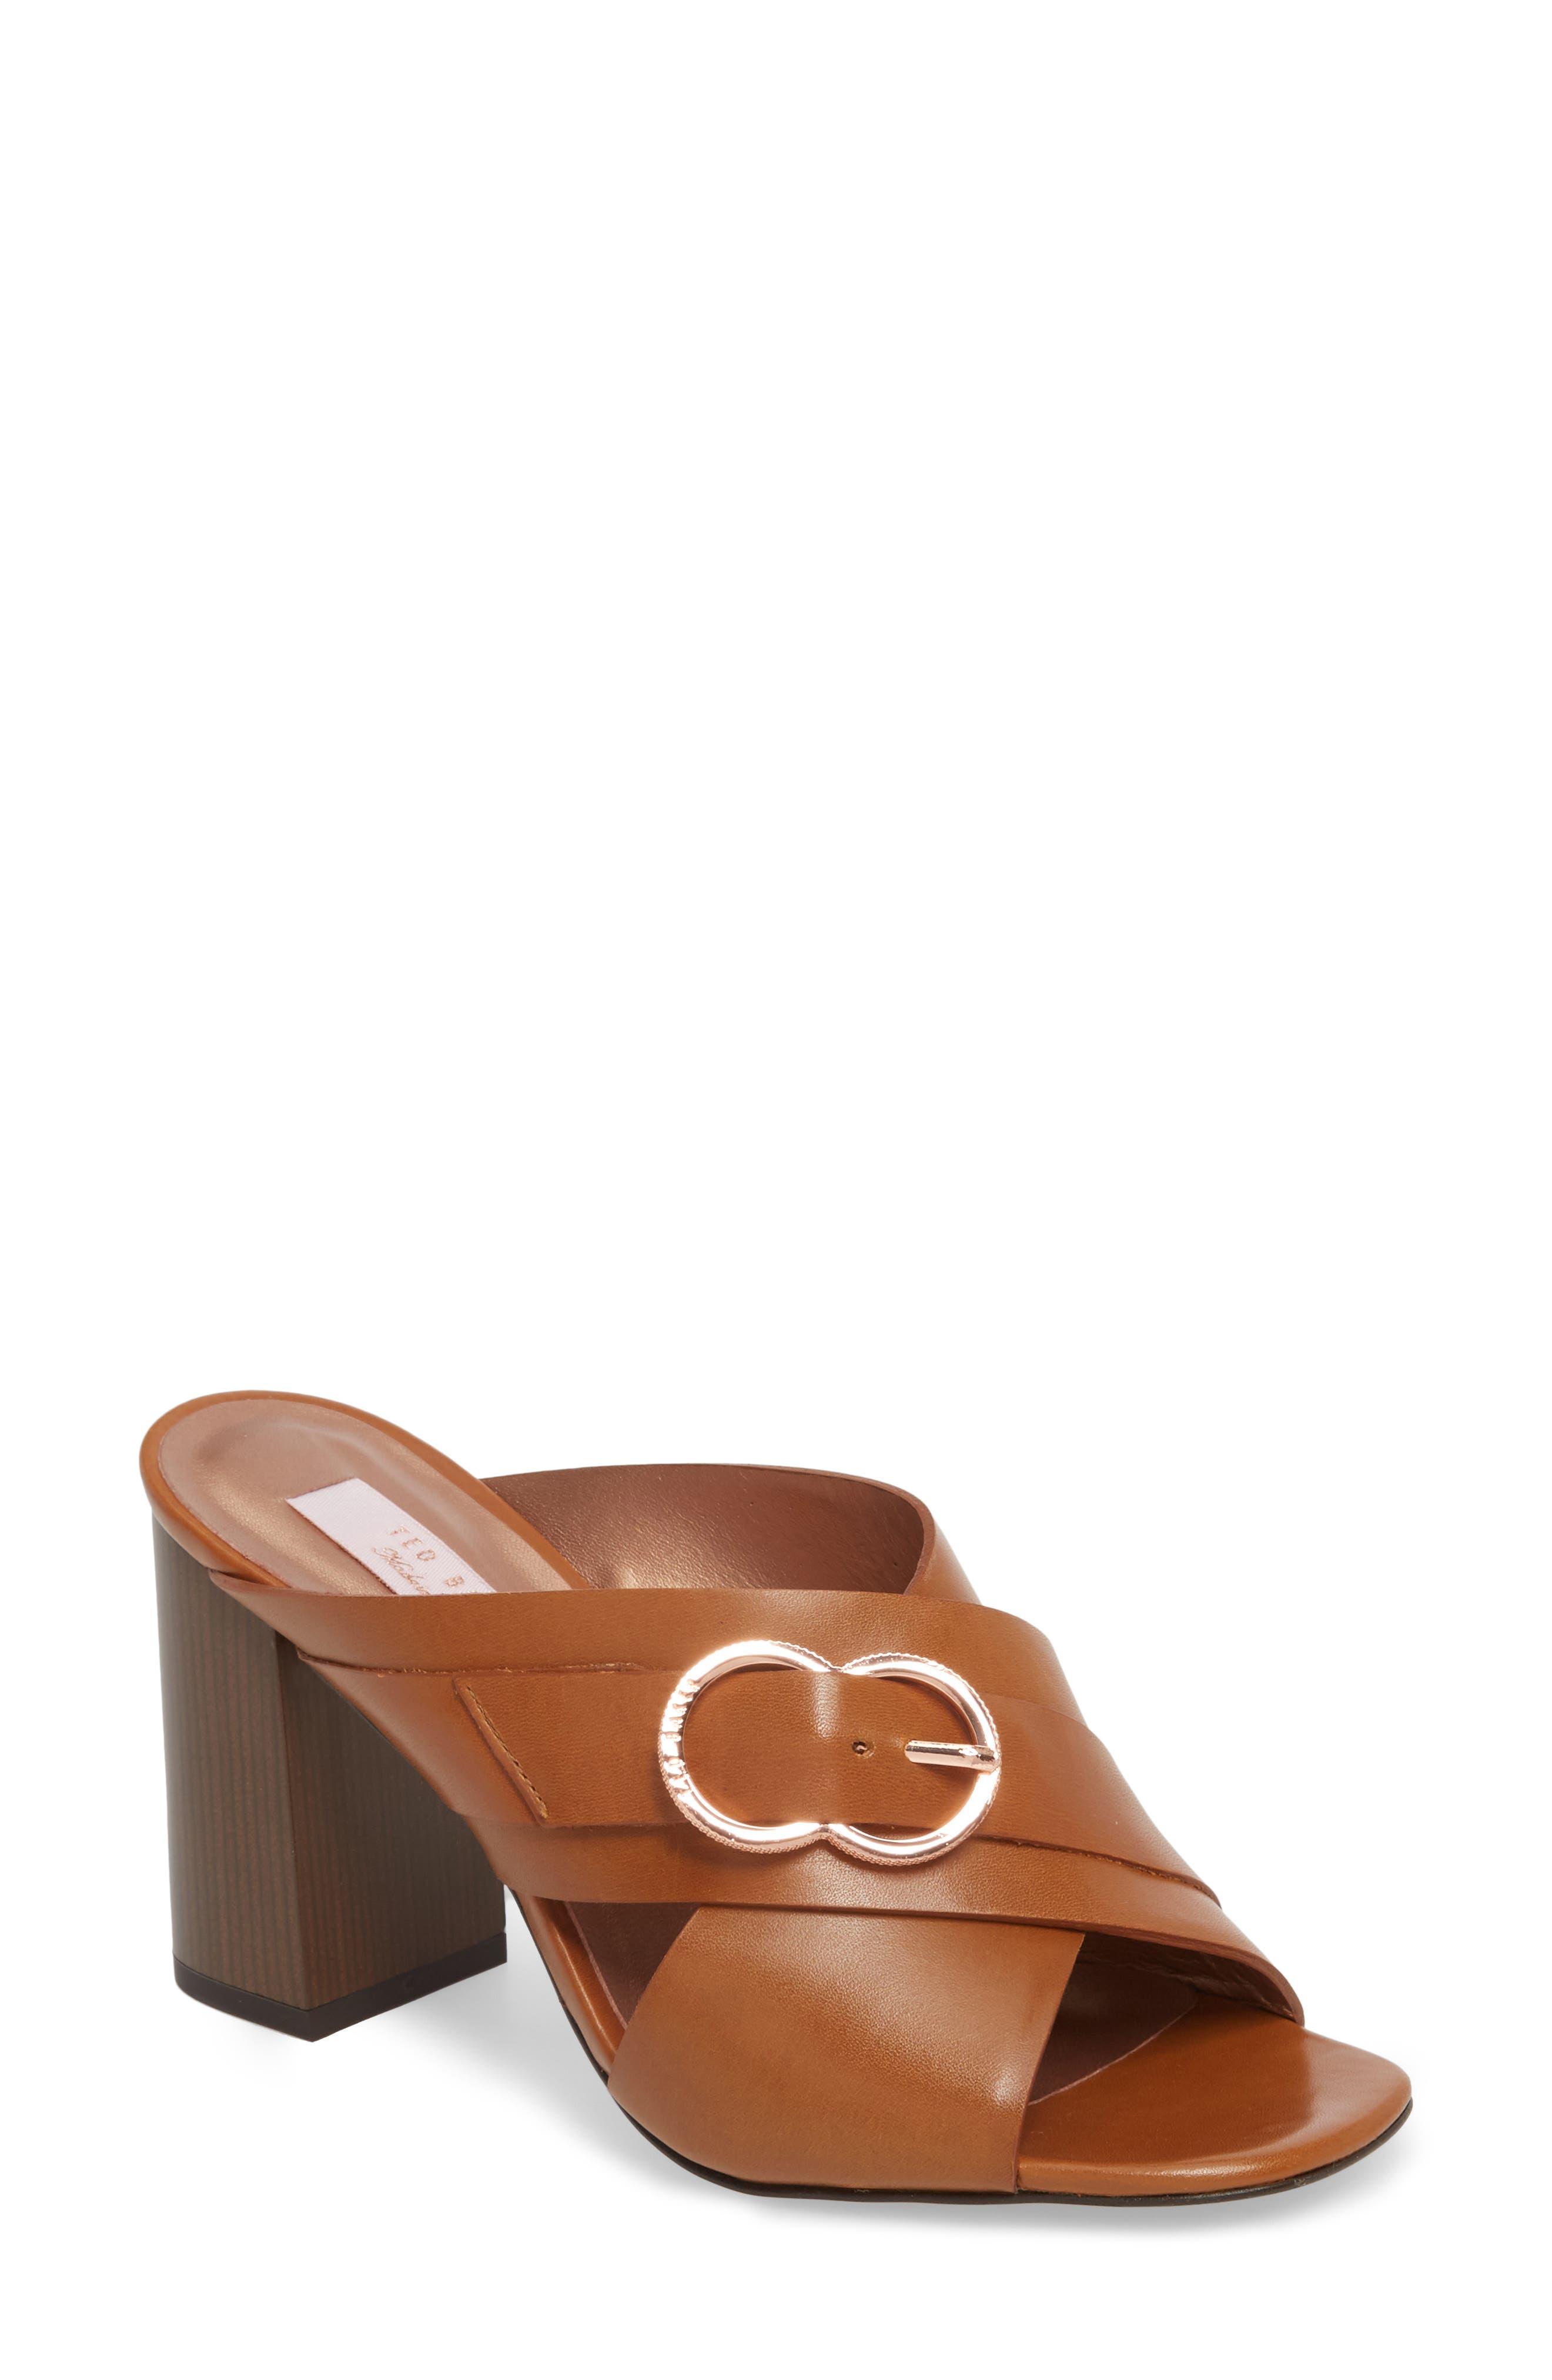 Maladas Slide Sandal,                             Main thumbnail 1, color,                             Tan Leather